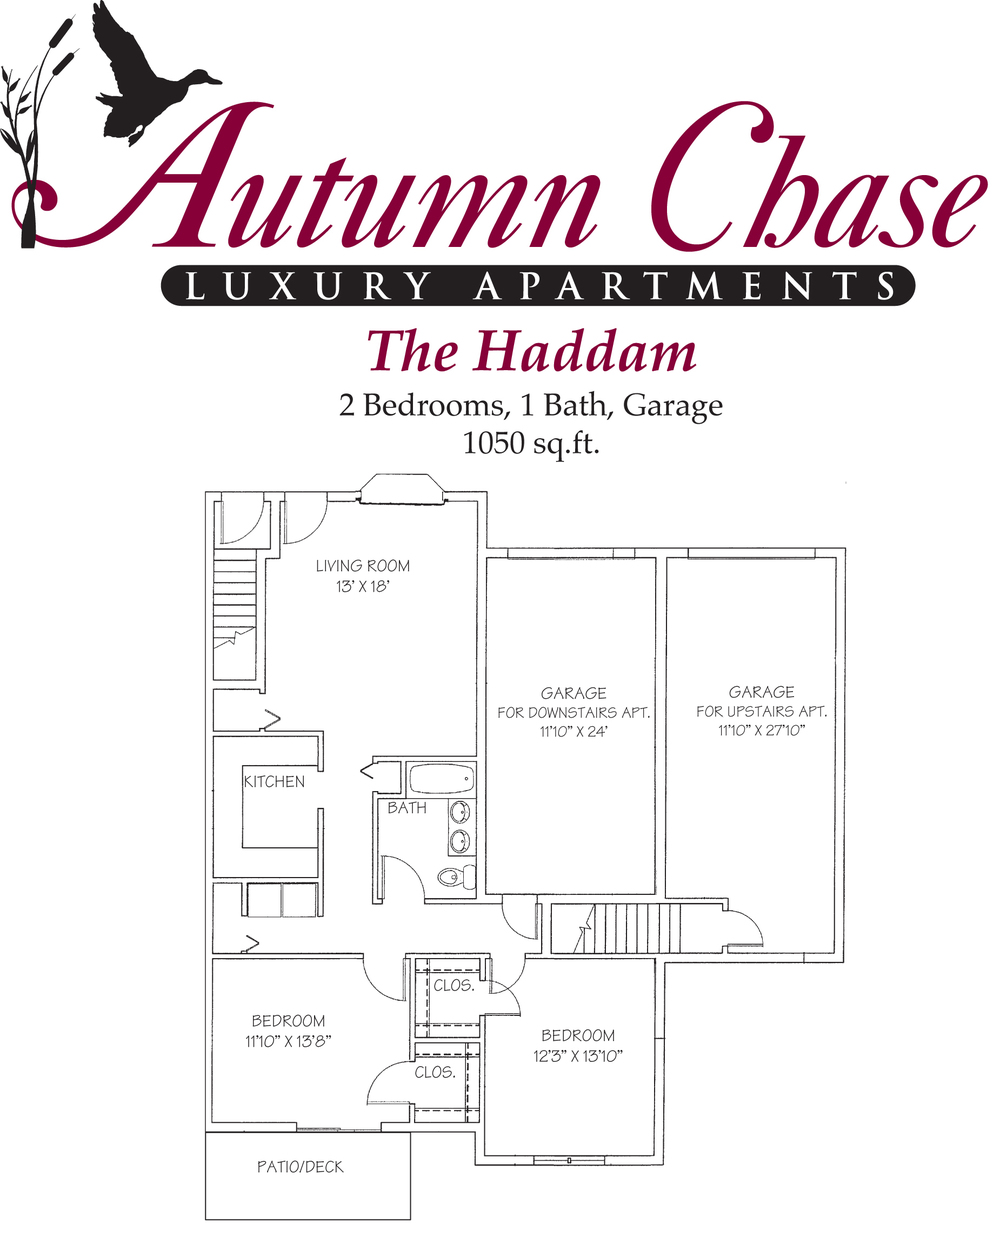 The Haddam.jpg